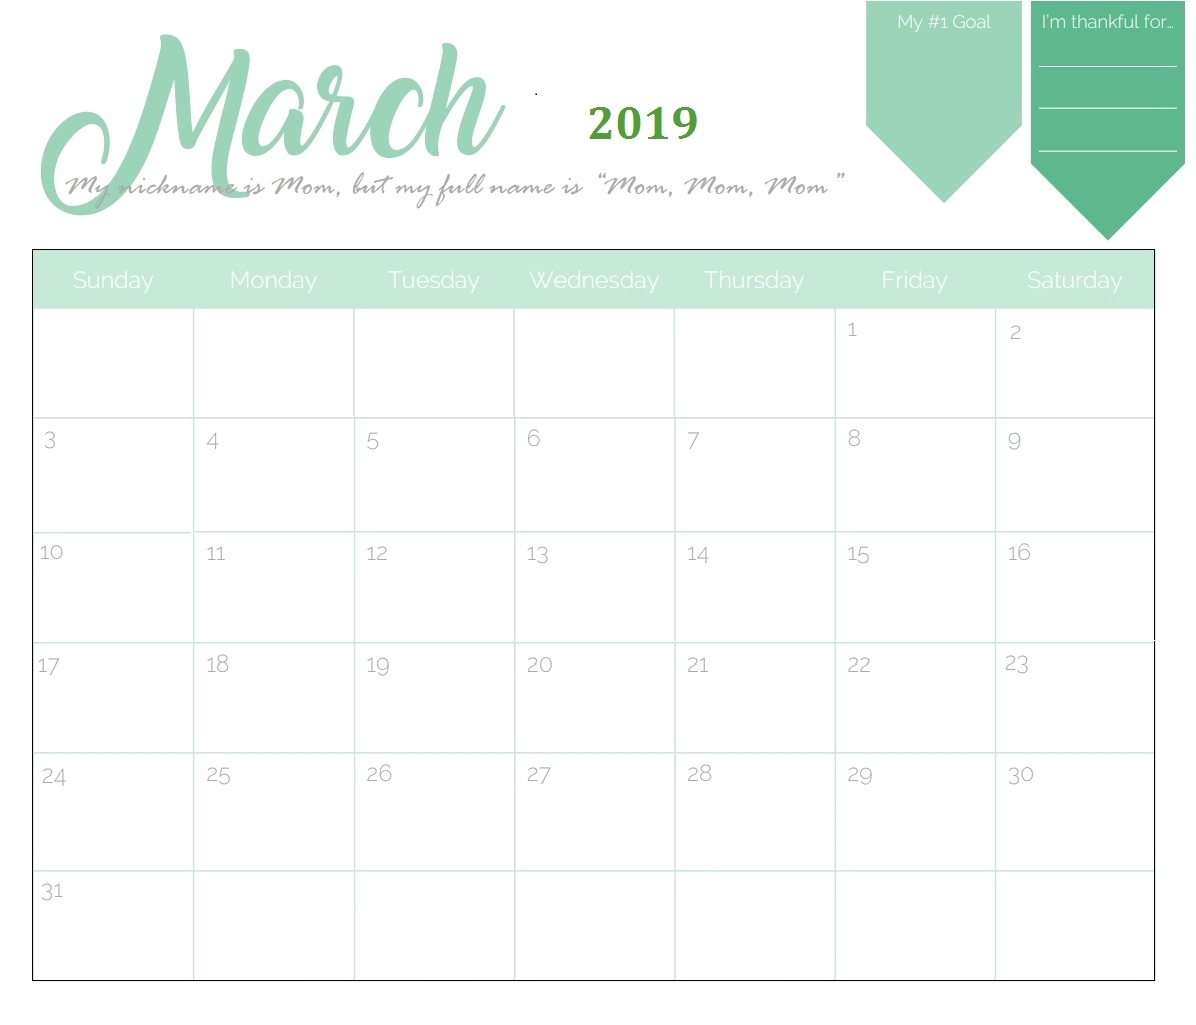 Print Free Monthly Calendar 2019 Free Printable 2019 Monthly Monthly Calendar To Print Free